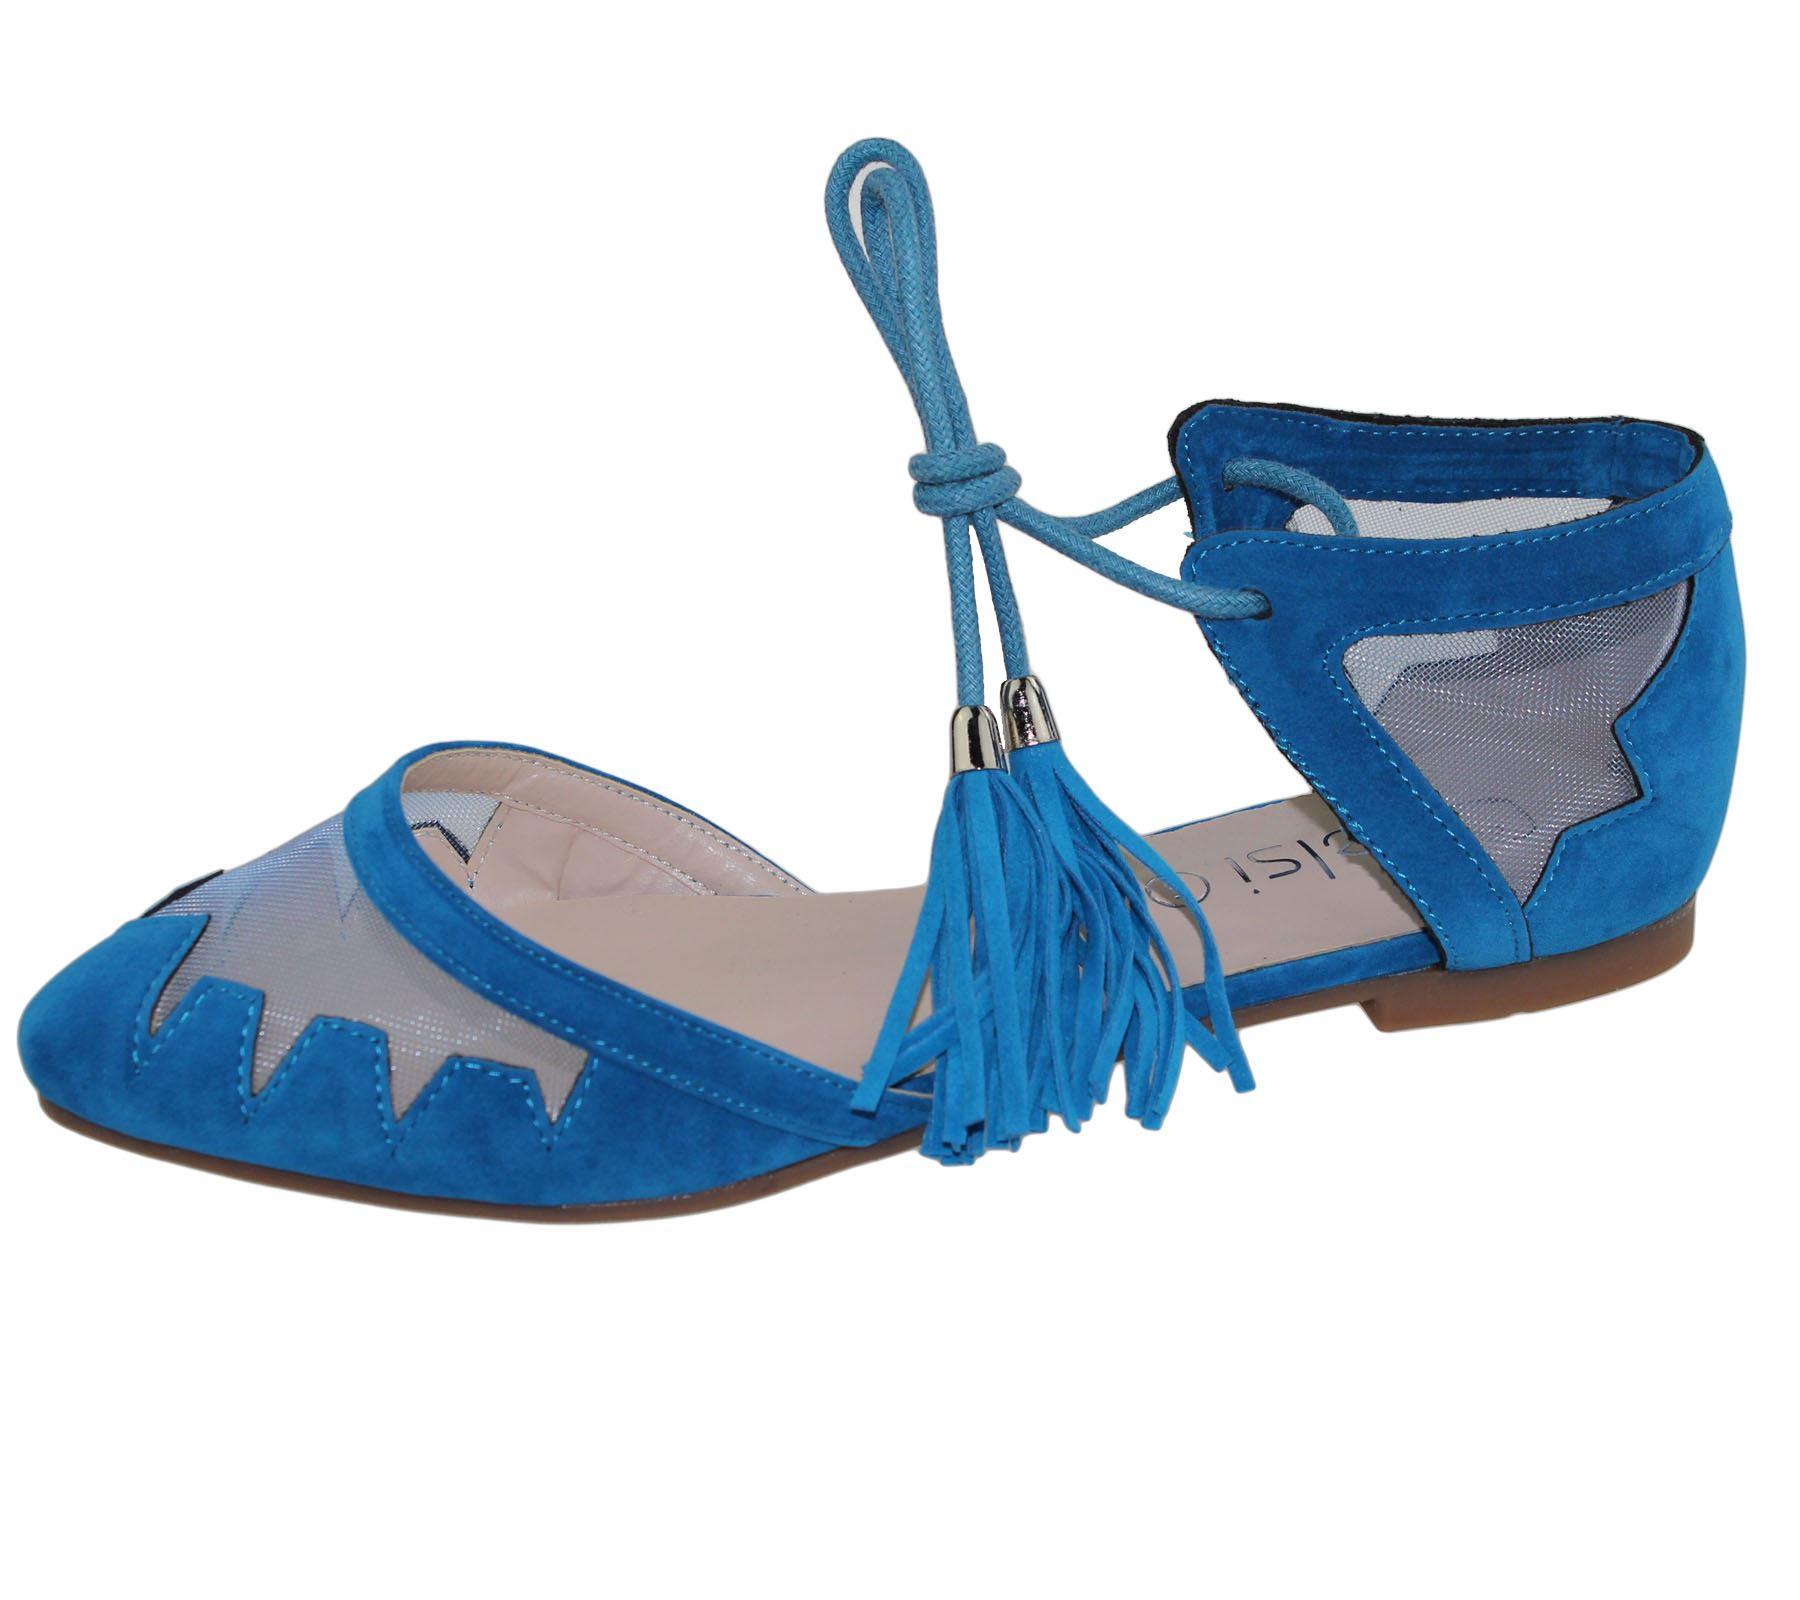 Womens-Flat-Ballerina-Dolly-Pumps-Ballet-Ladies-Summer-Mesh-Tassel-Shoes-Sandals thumbnail 6